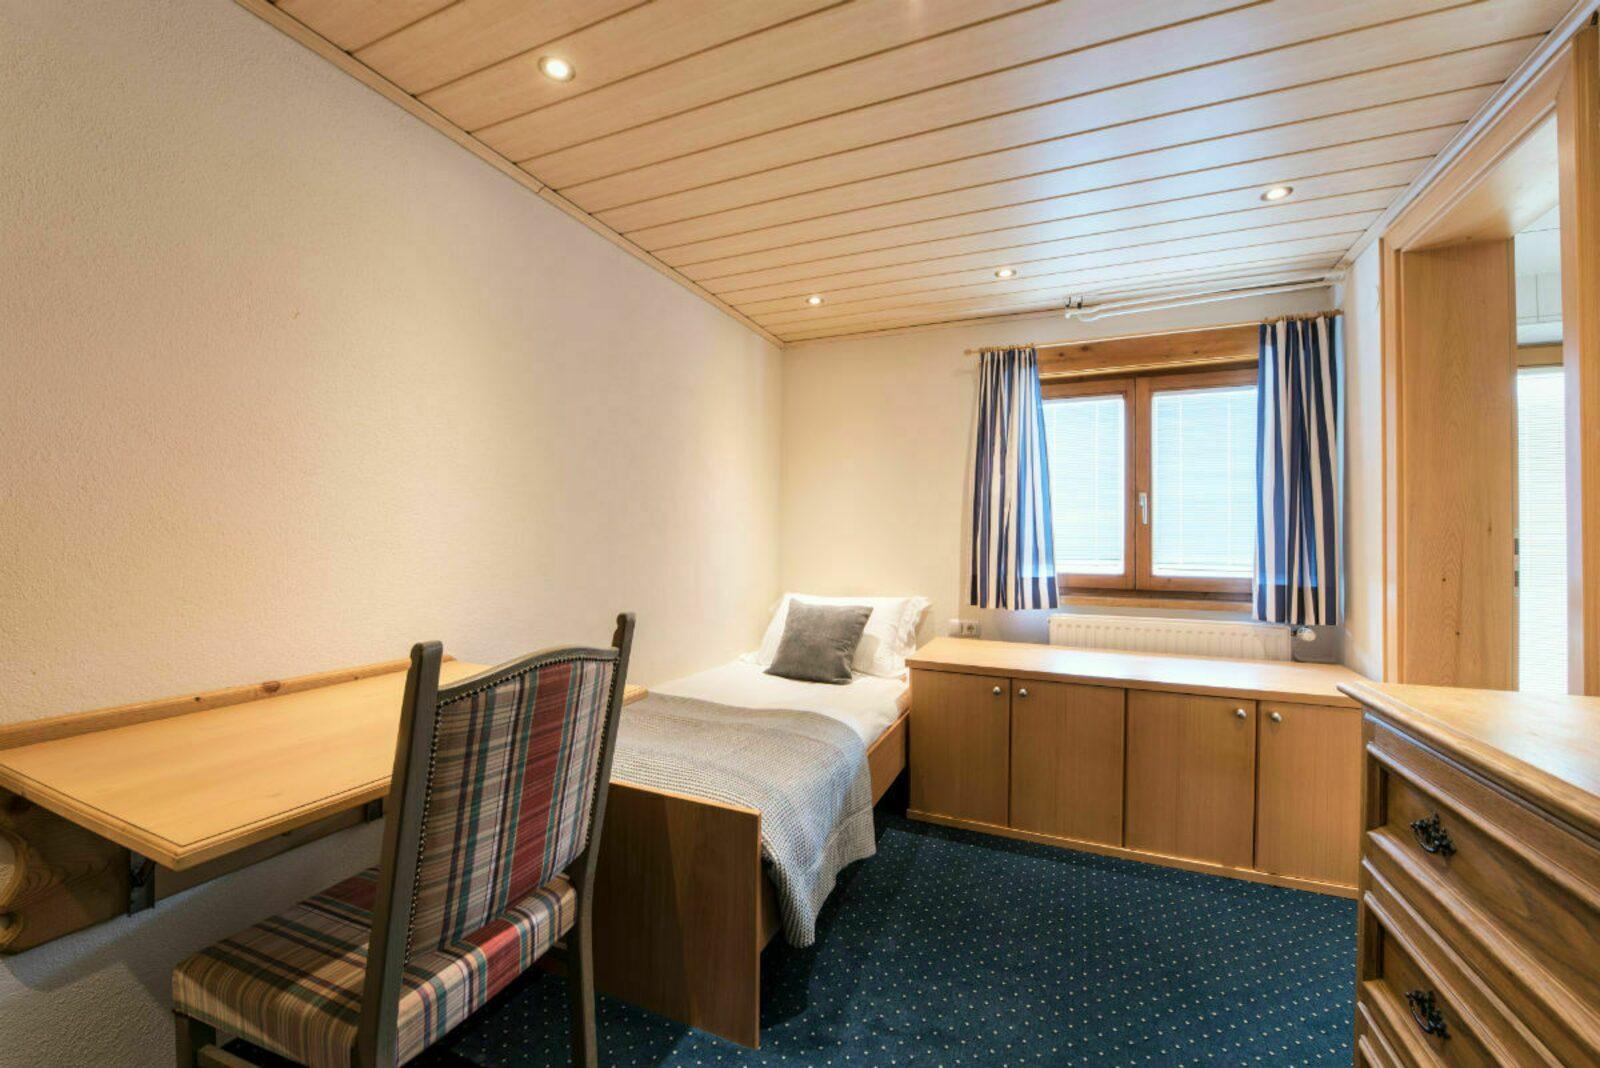 Hotelzimmer Deluxe | 1 Pers.